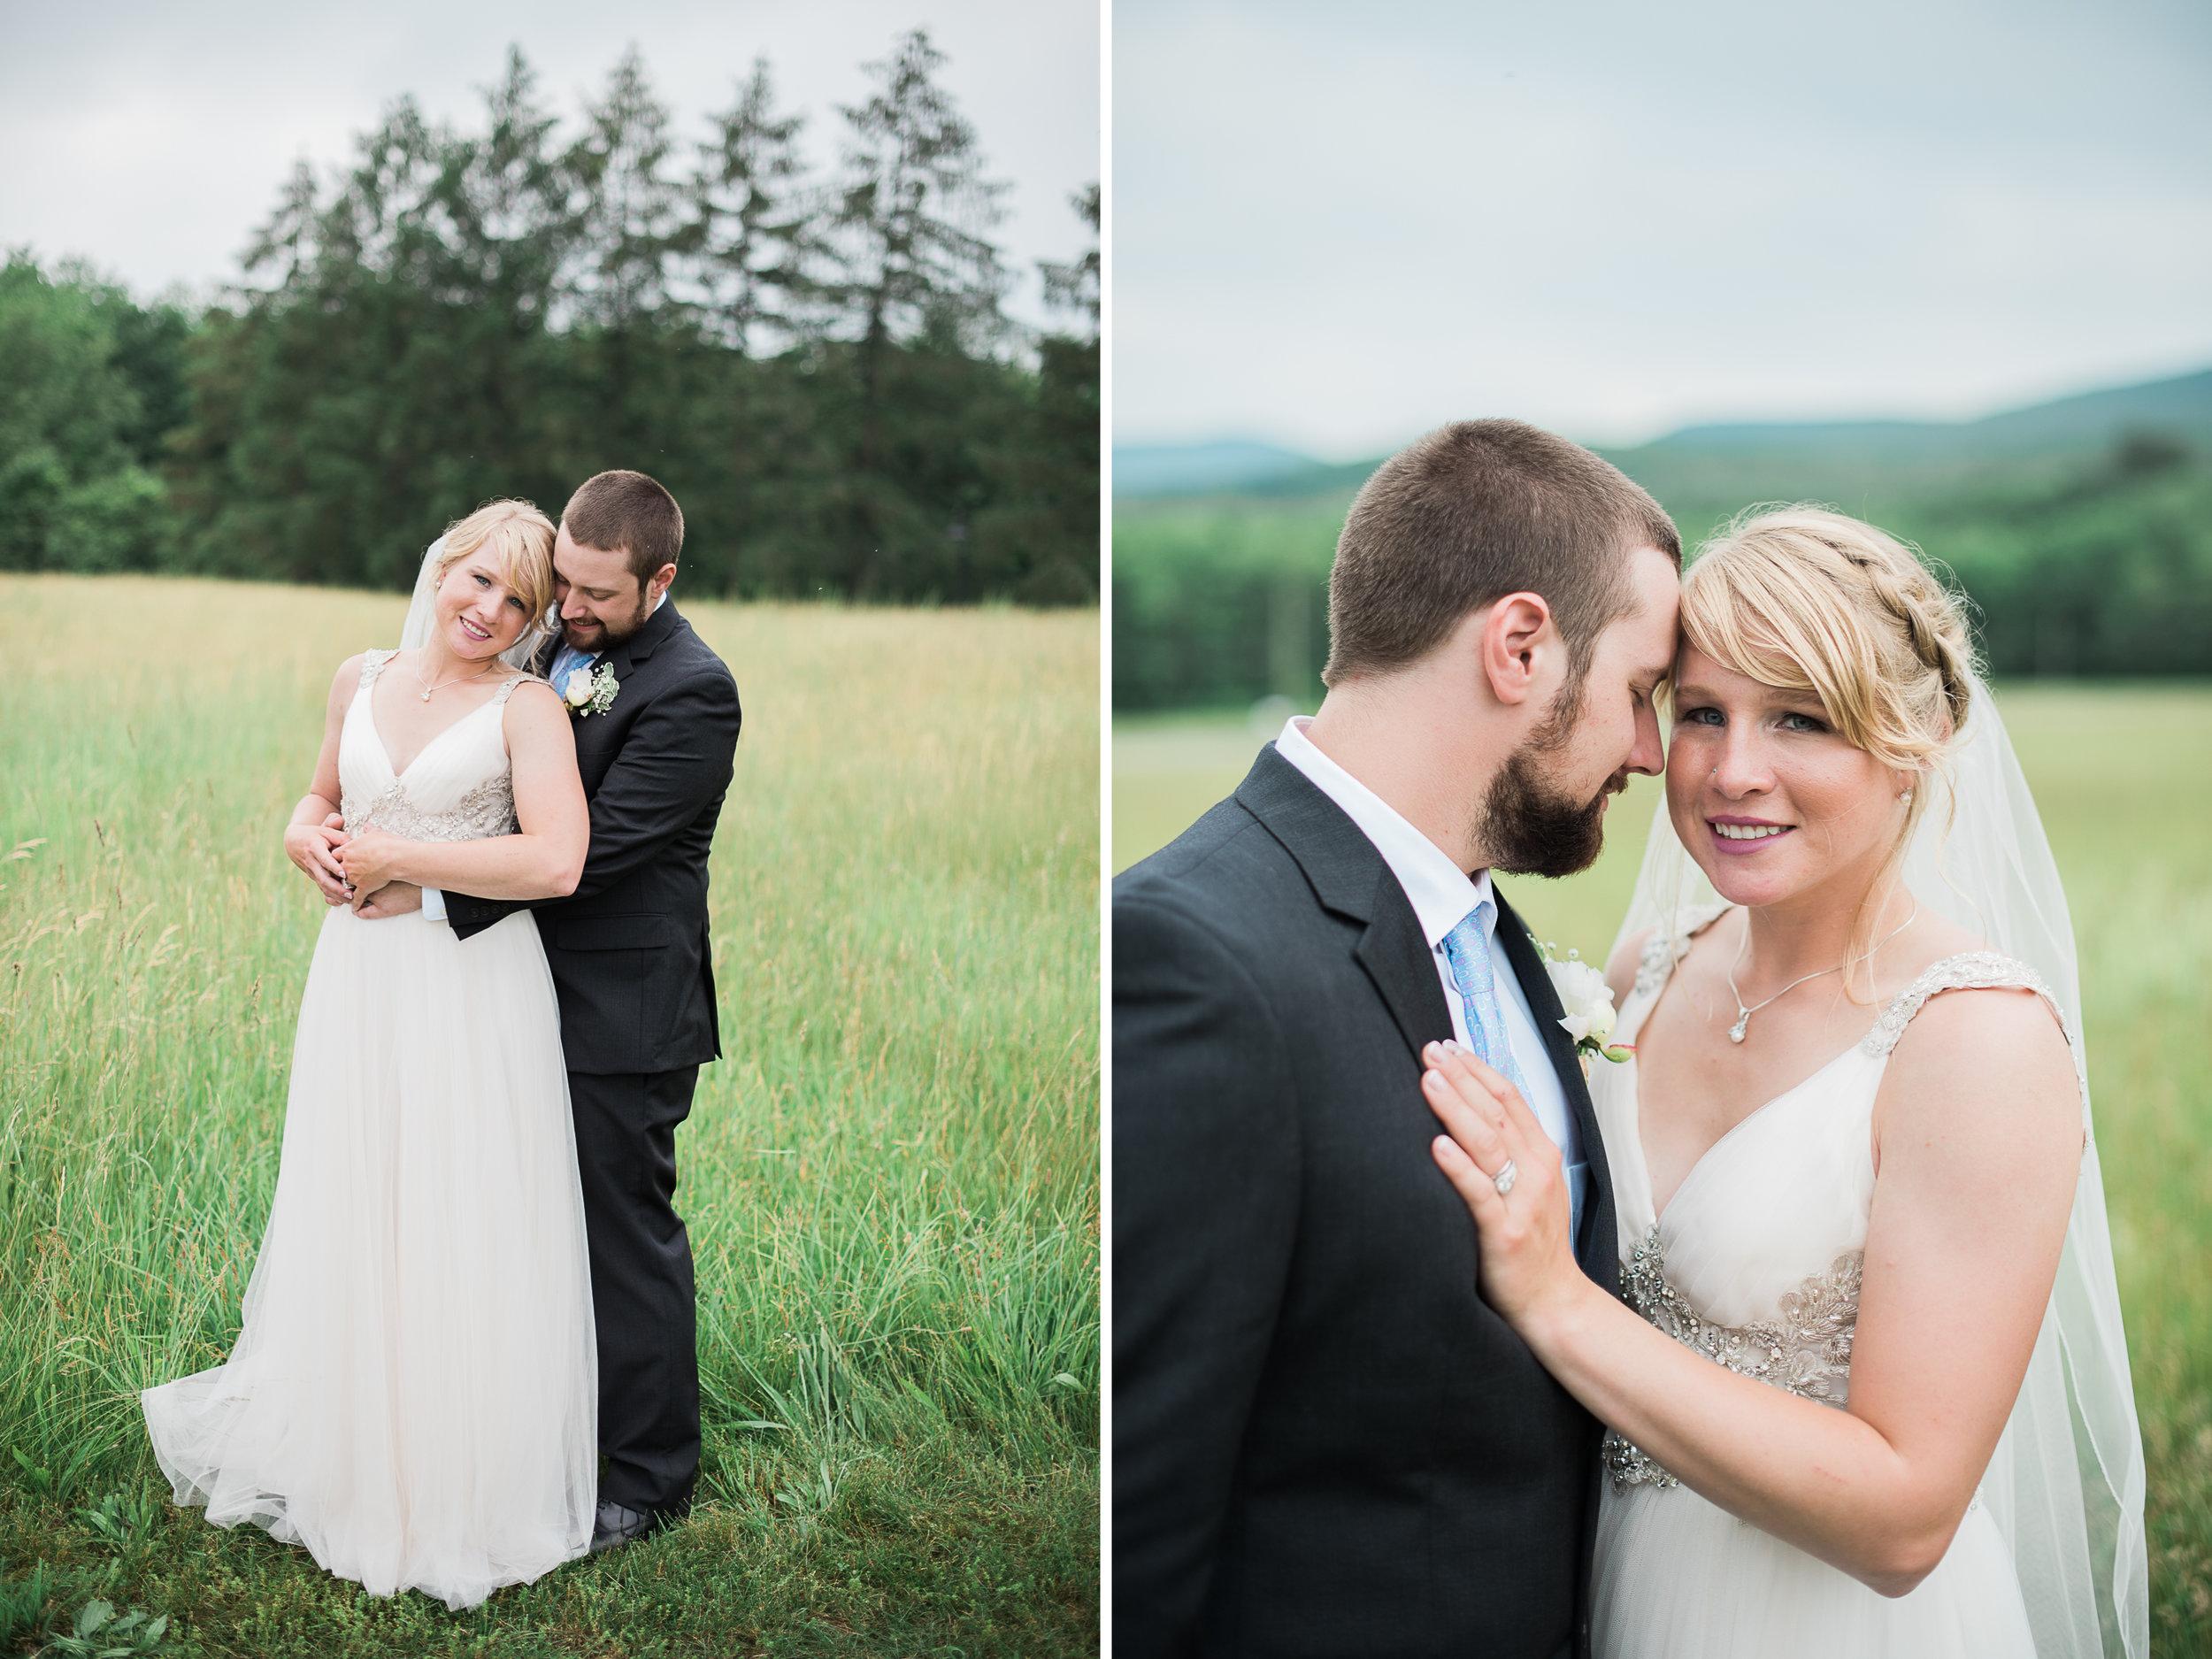 Wedding Photographers in Stockbridge